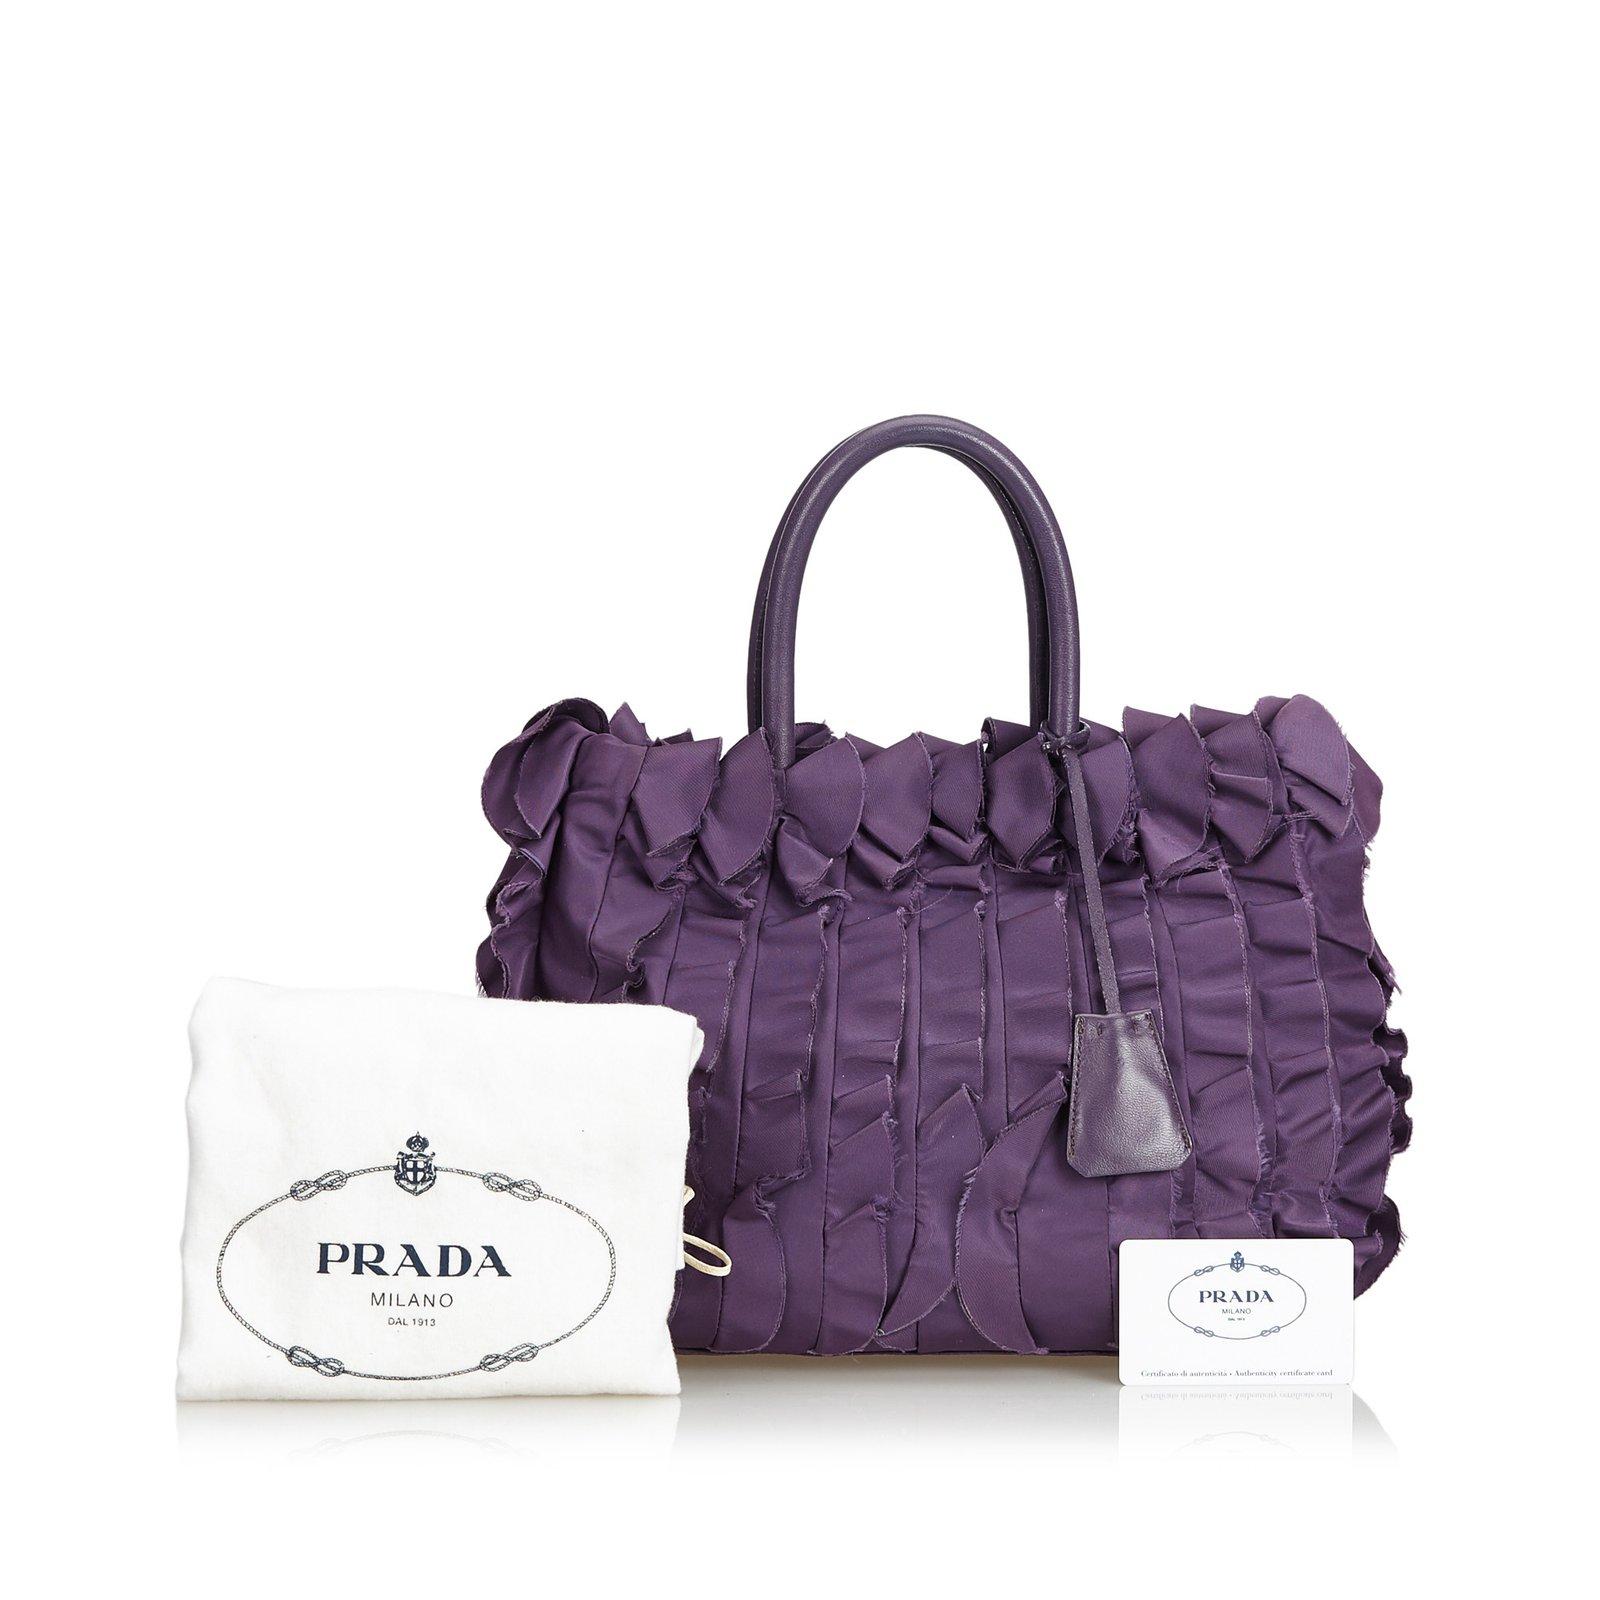 27135b57c394 Prada Gathered Nylon Tote Bag Totes Leather